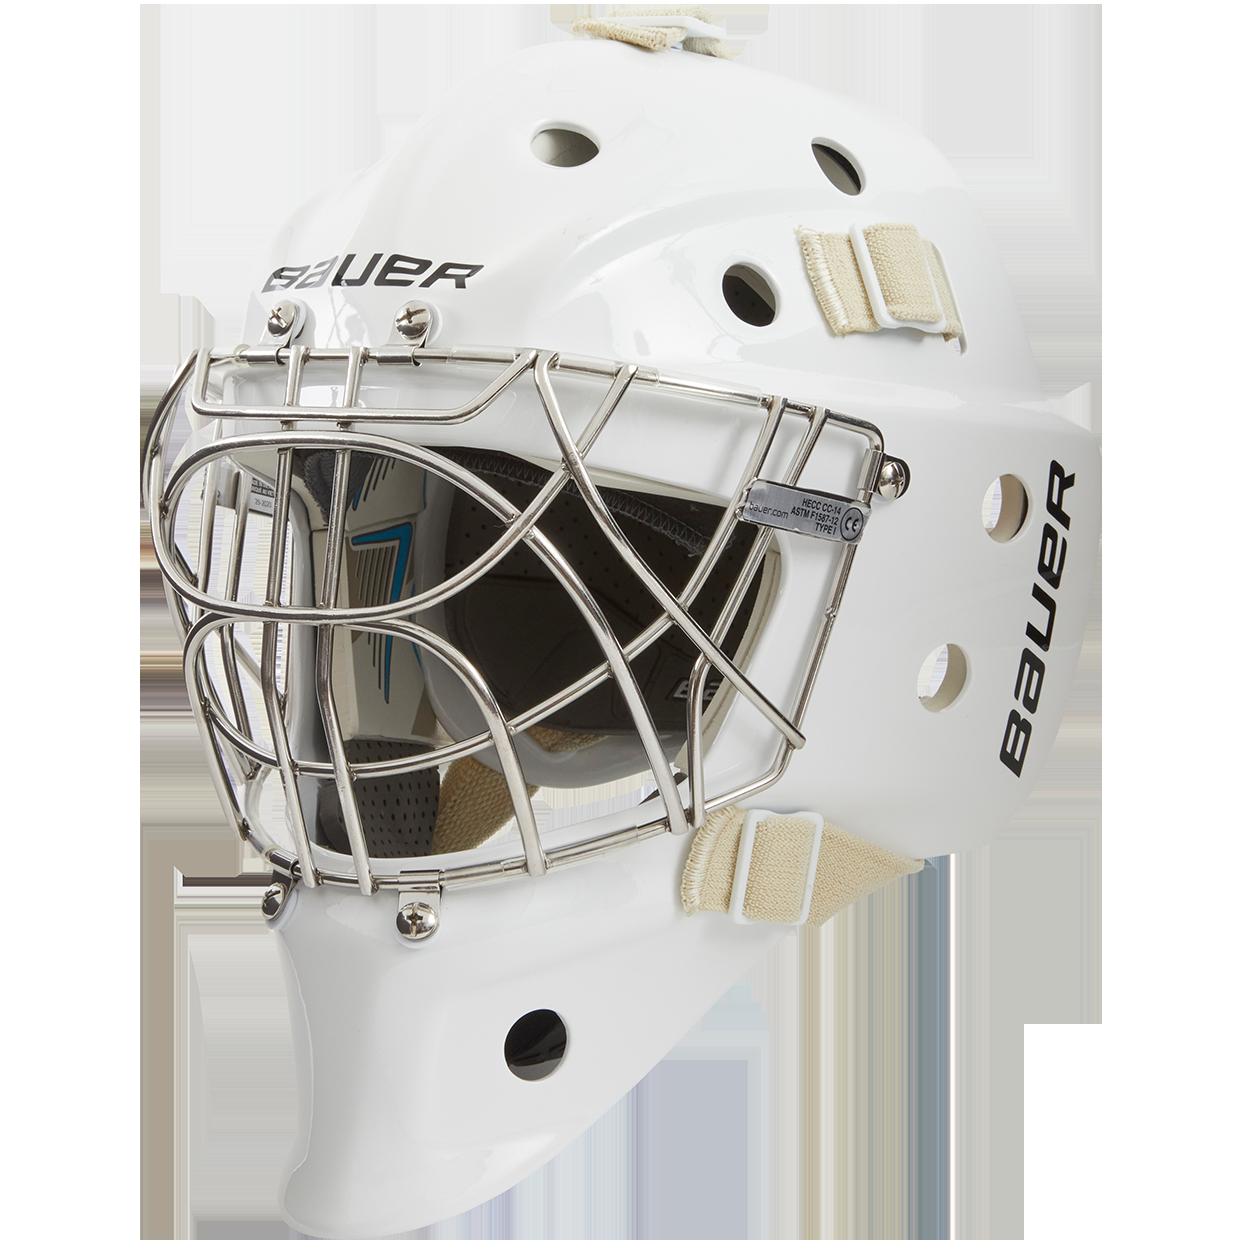 940 Goal Mask Senior CCE,White,medium